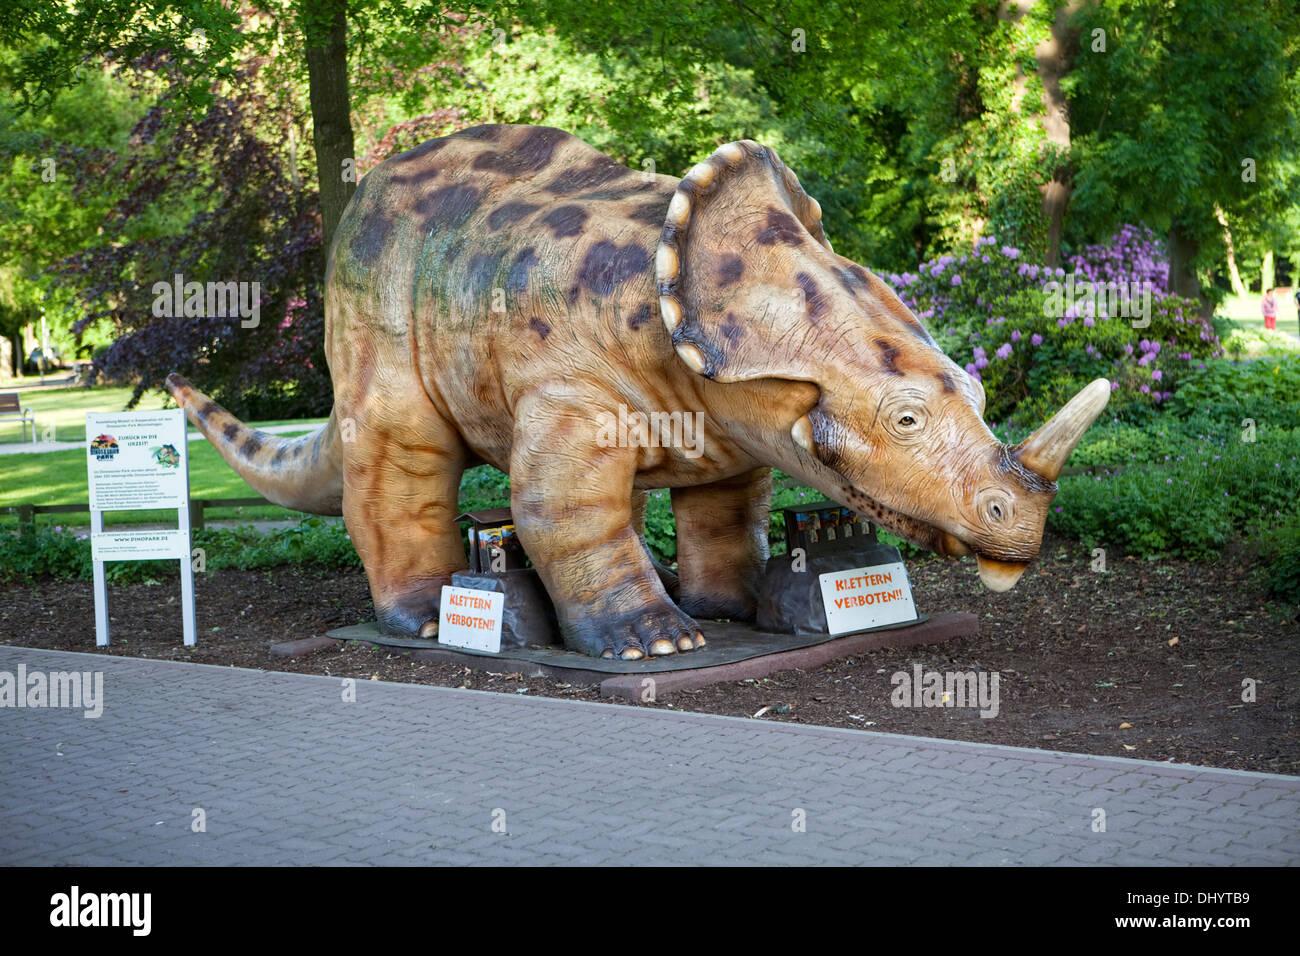 Model of a Dinosaur, Steinhuder Meer Nature Park, Steinhude Sea, Steinhude, Wunstorf, Lower Saxony, Germany, Europe - Stock Image